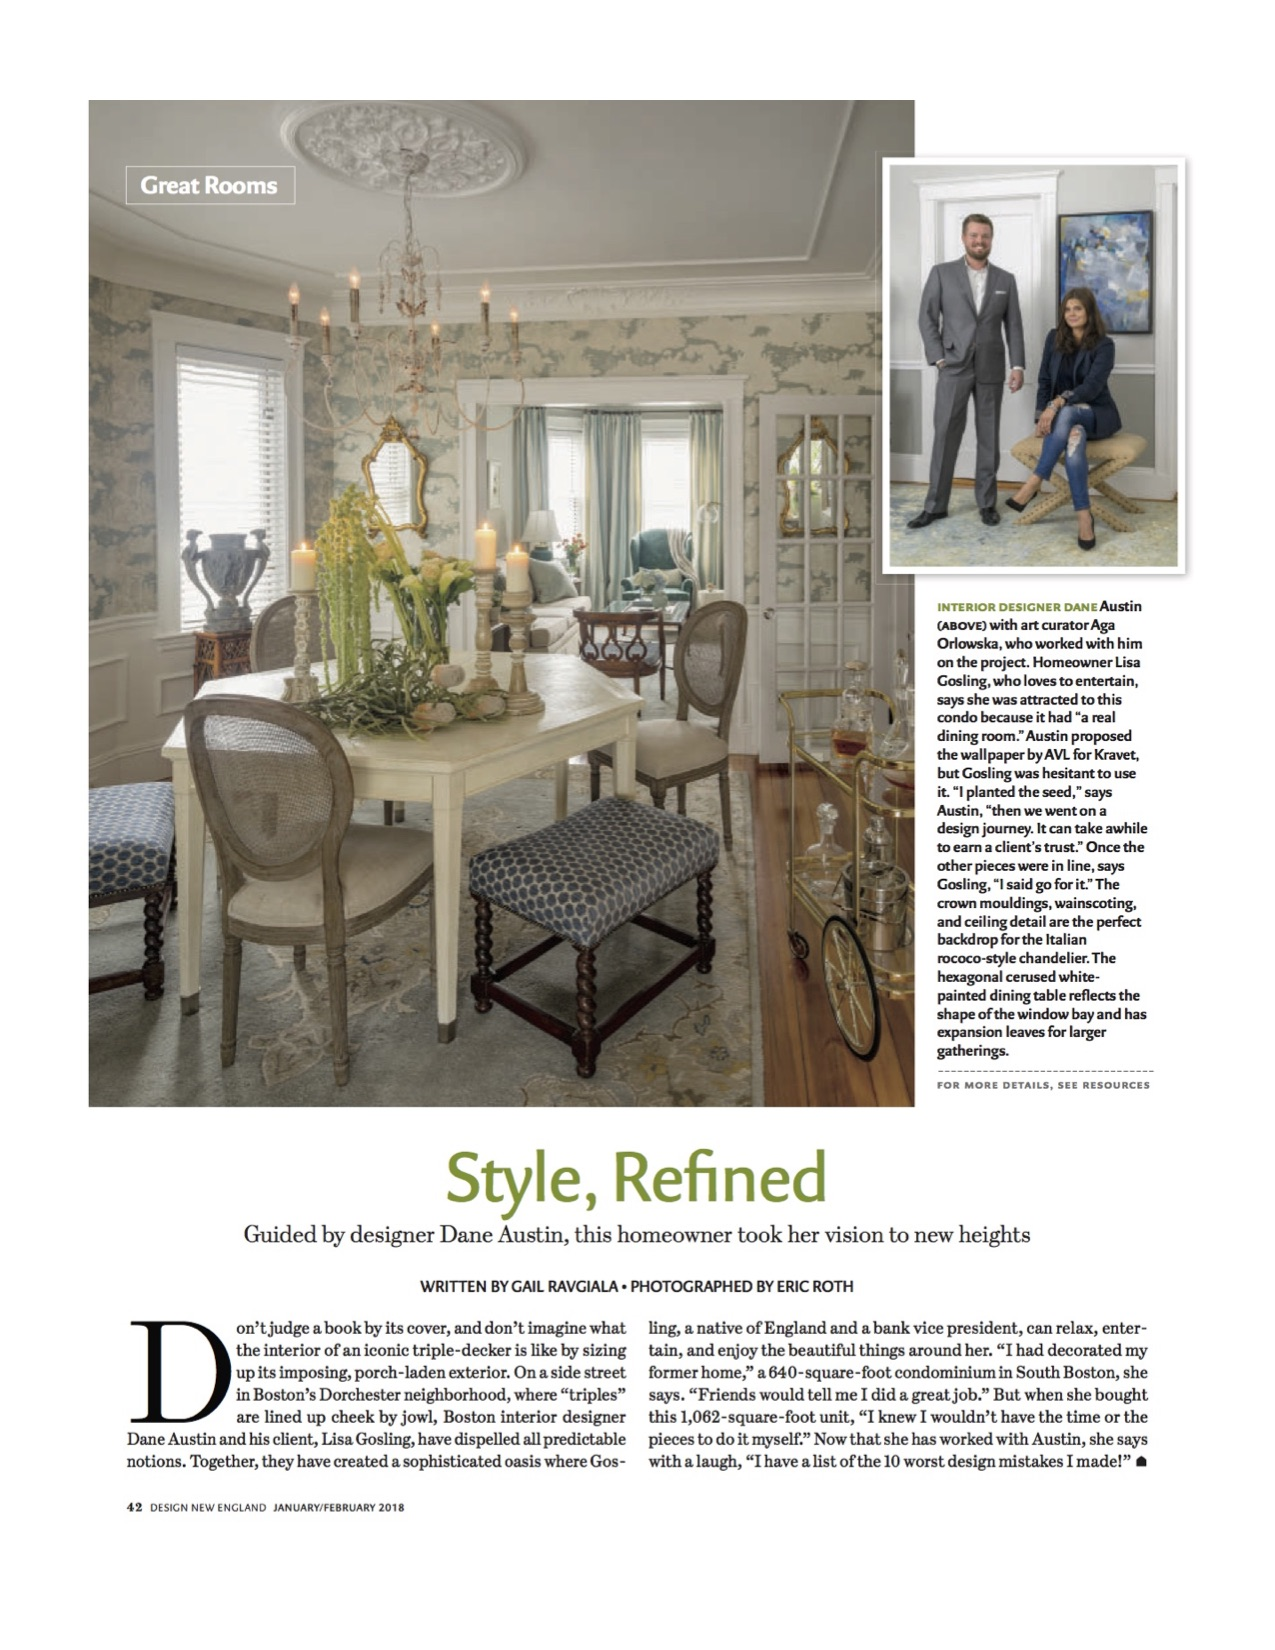 Style, Refined. Design New England Magazine January- February 2018 issue